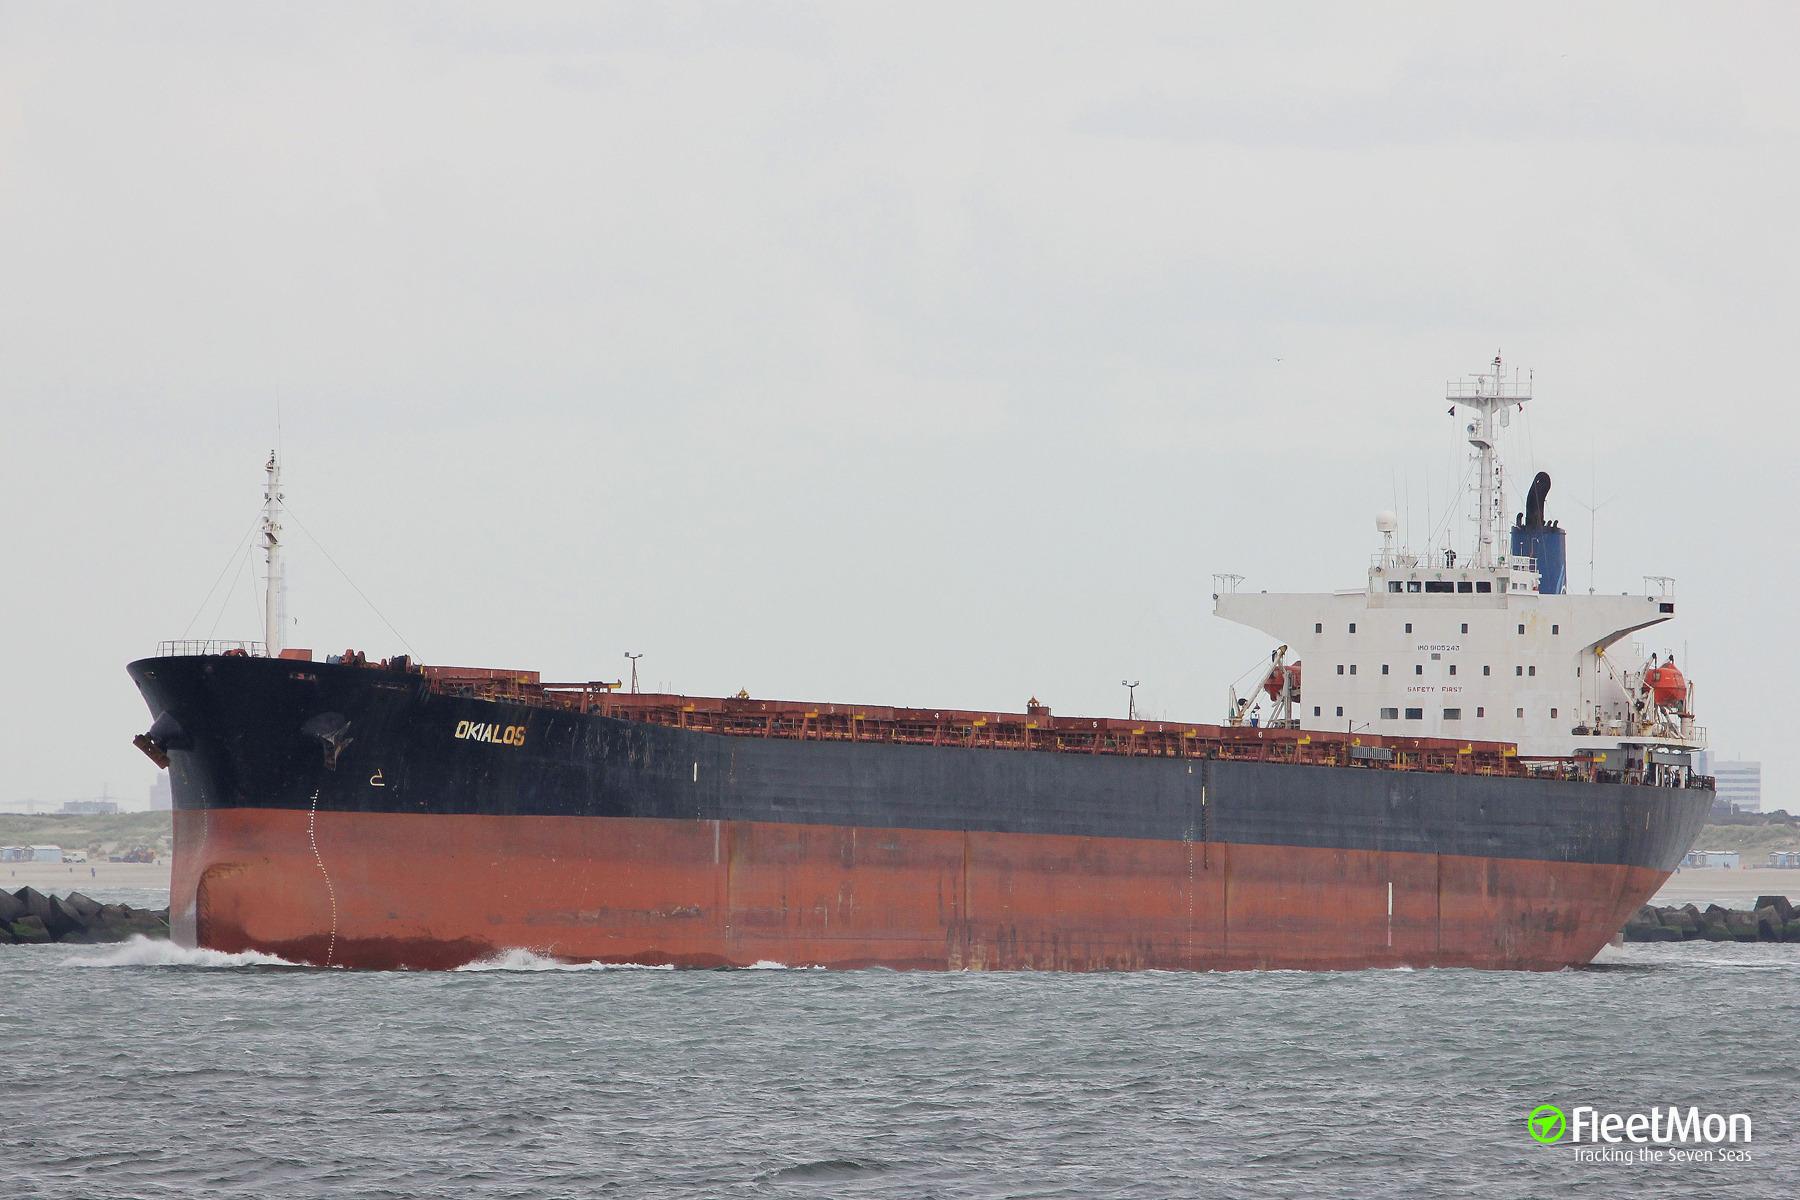 Bulk carrier Okialos limped to Ponta Delgada with engine problem